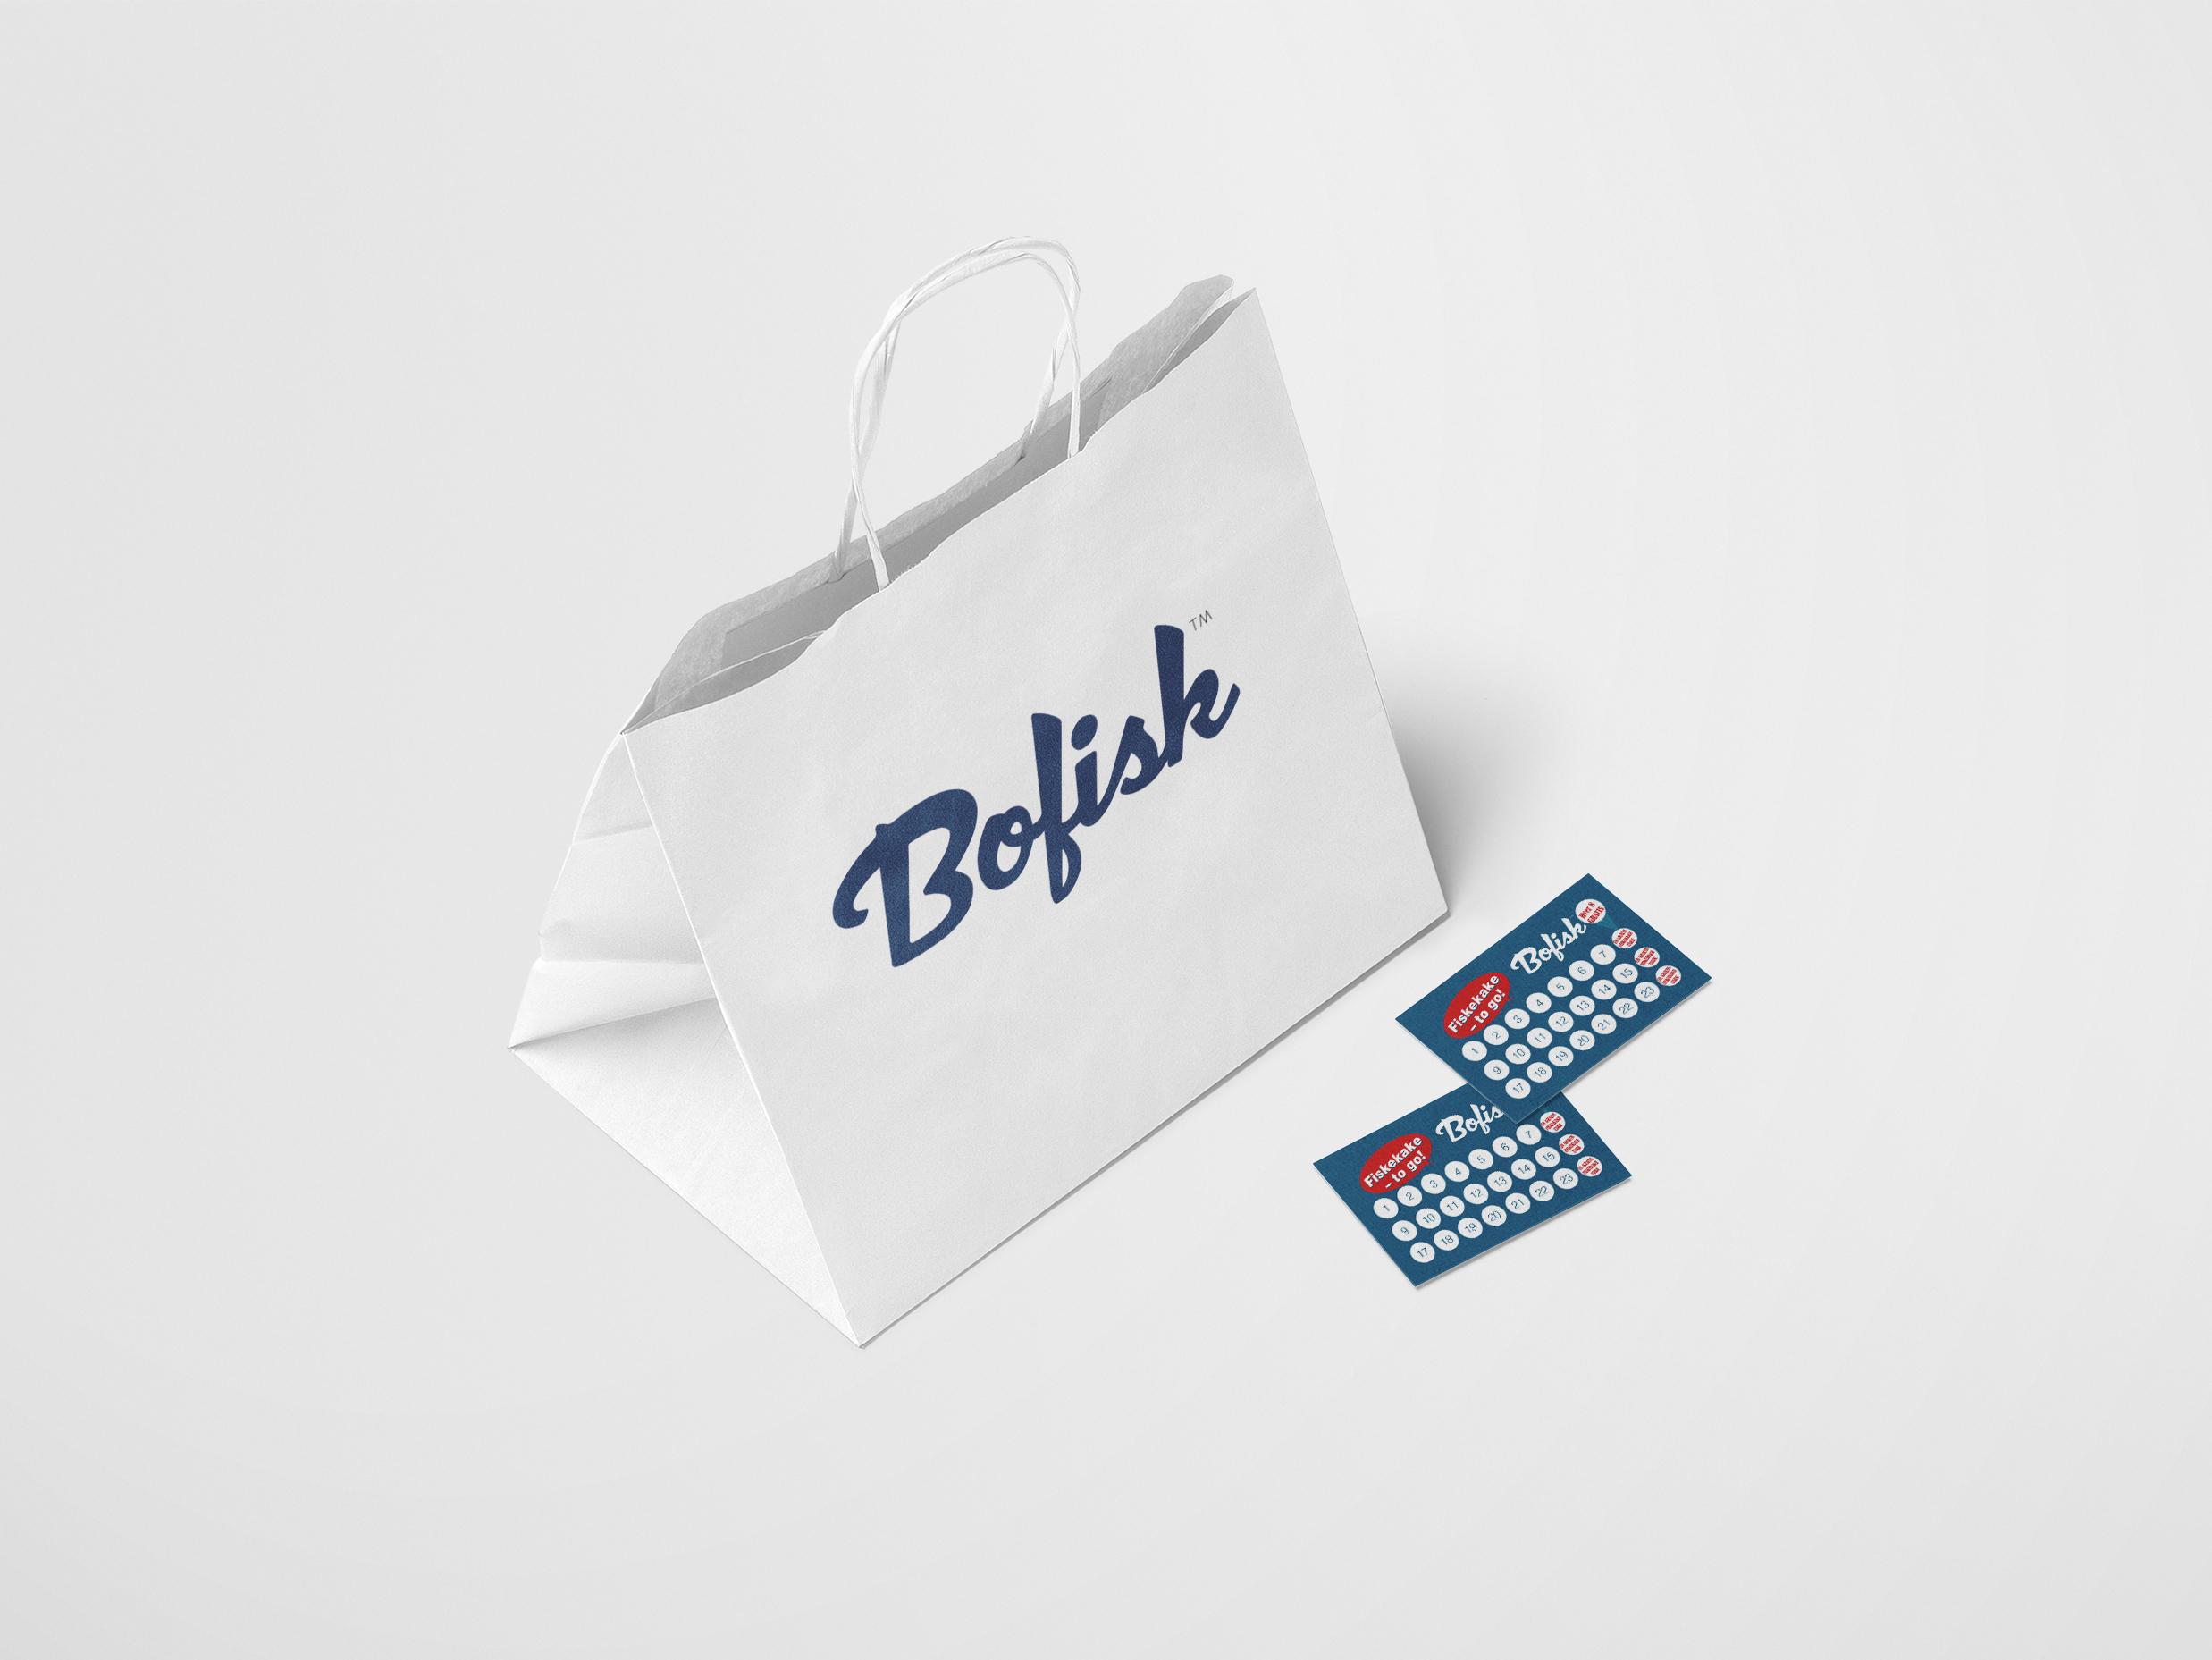 Logo og bonuskort, Bofisk